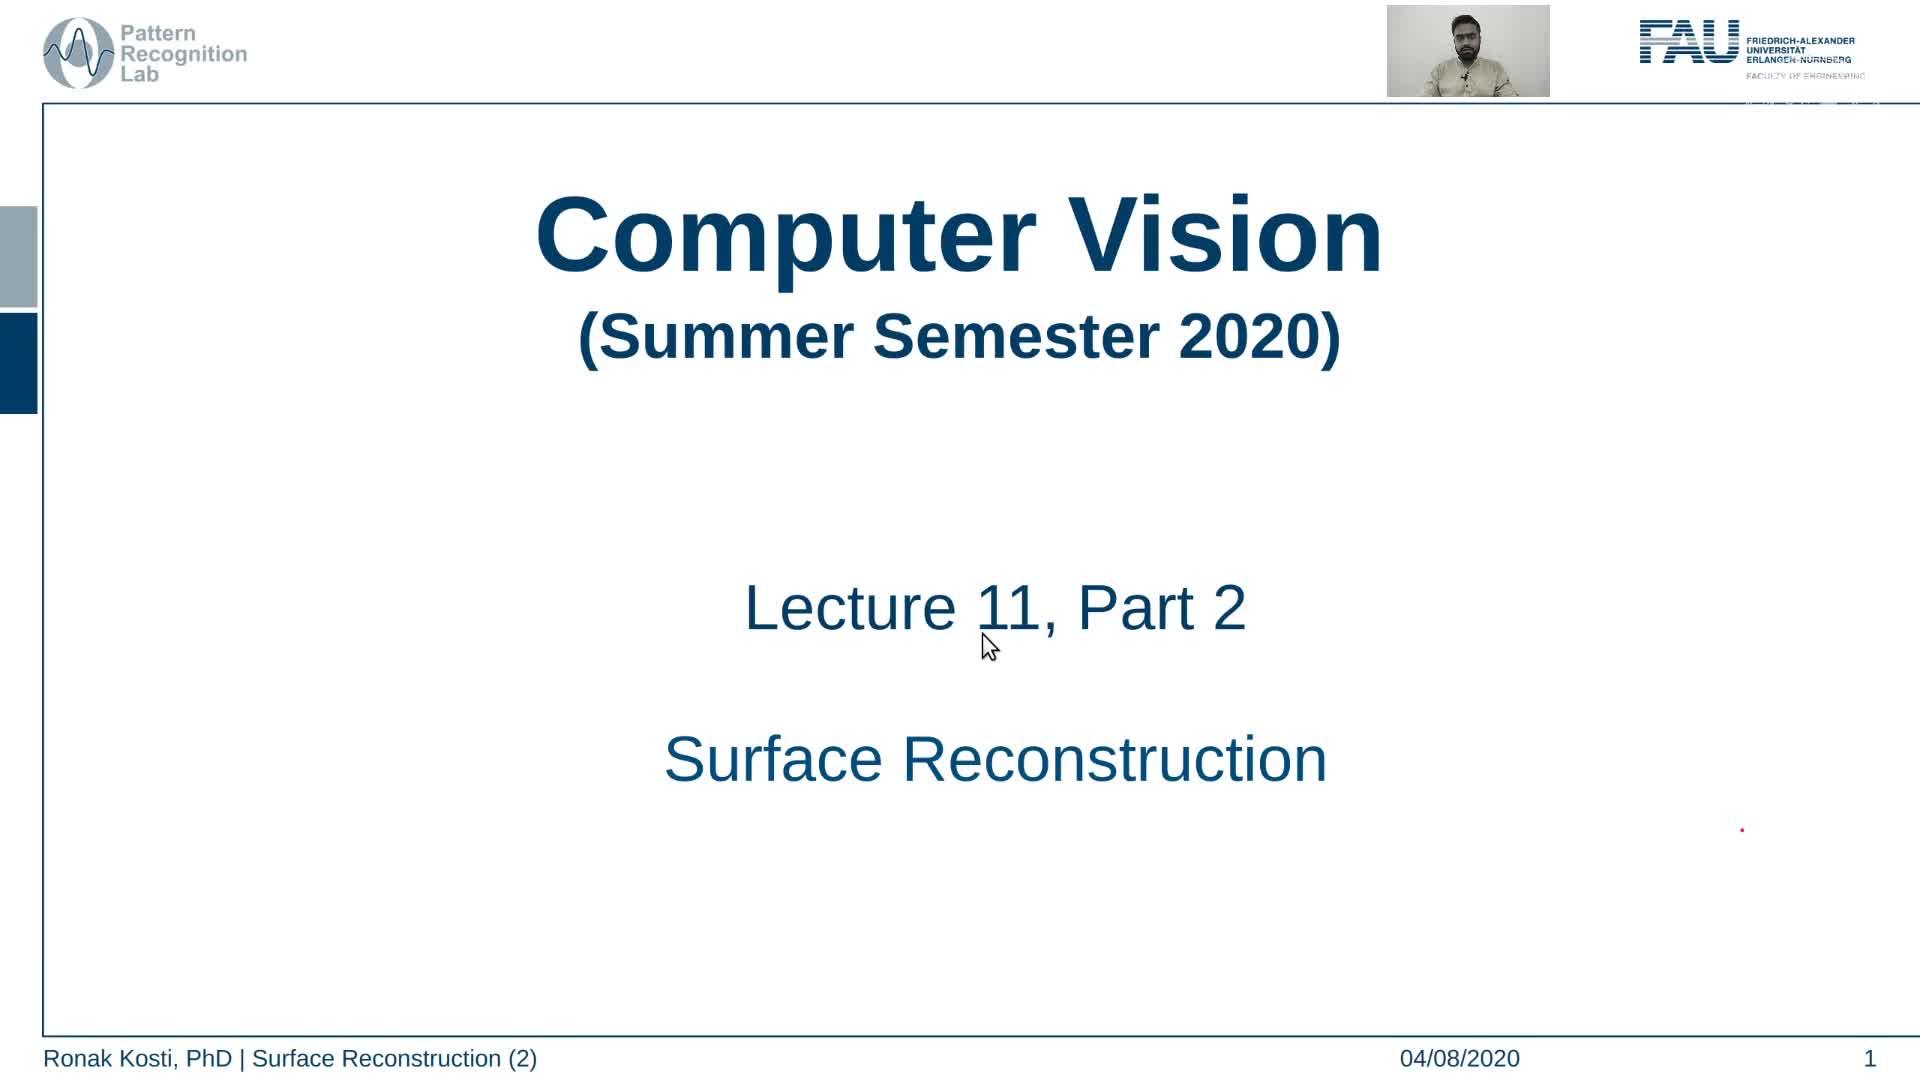 Surface Reconstruction (Lecture 11, Part 2) preview image